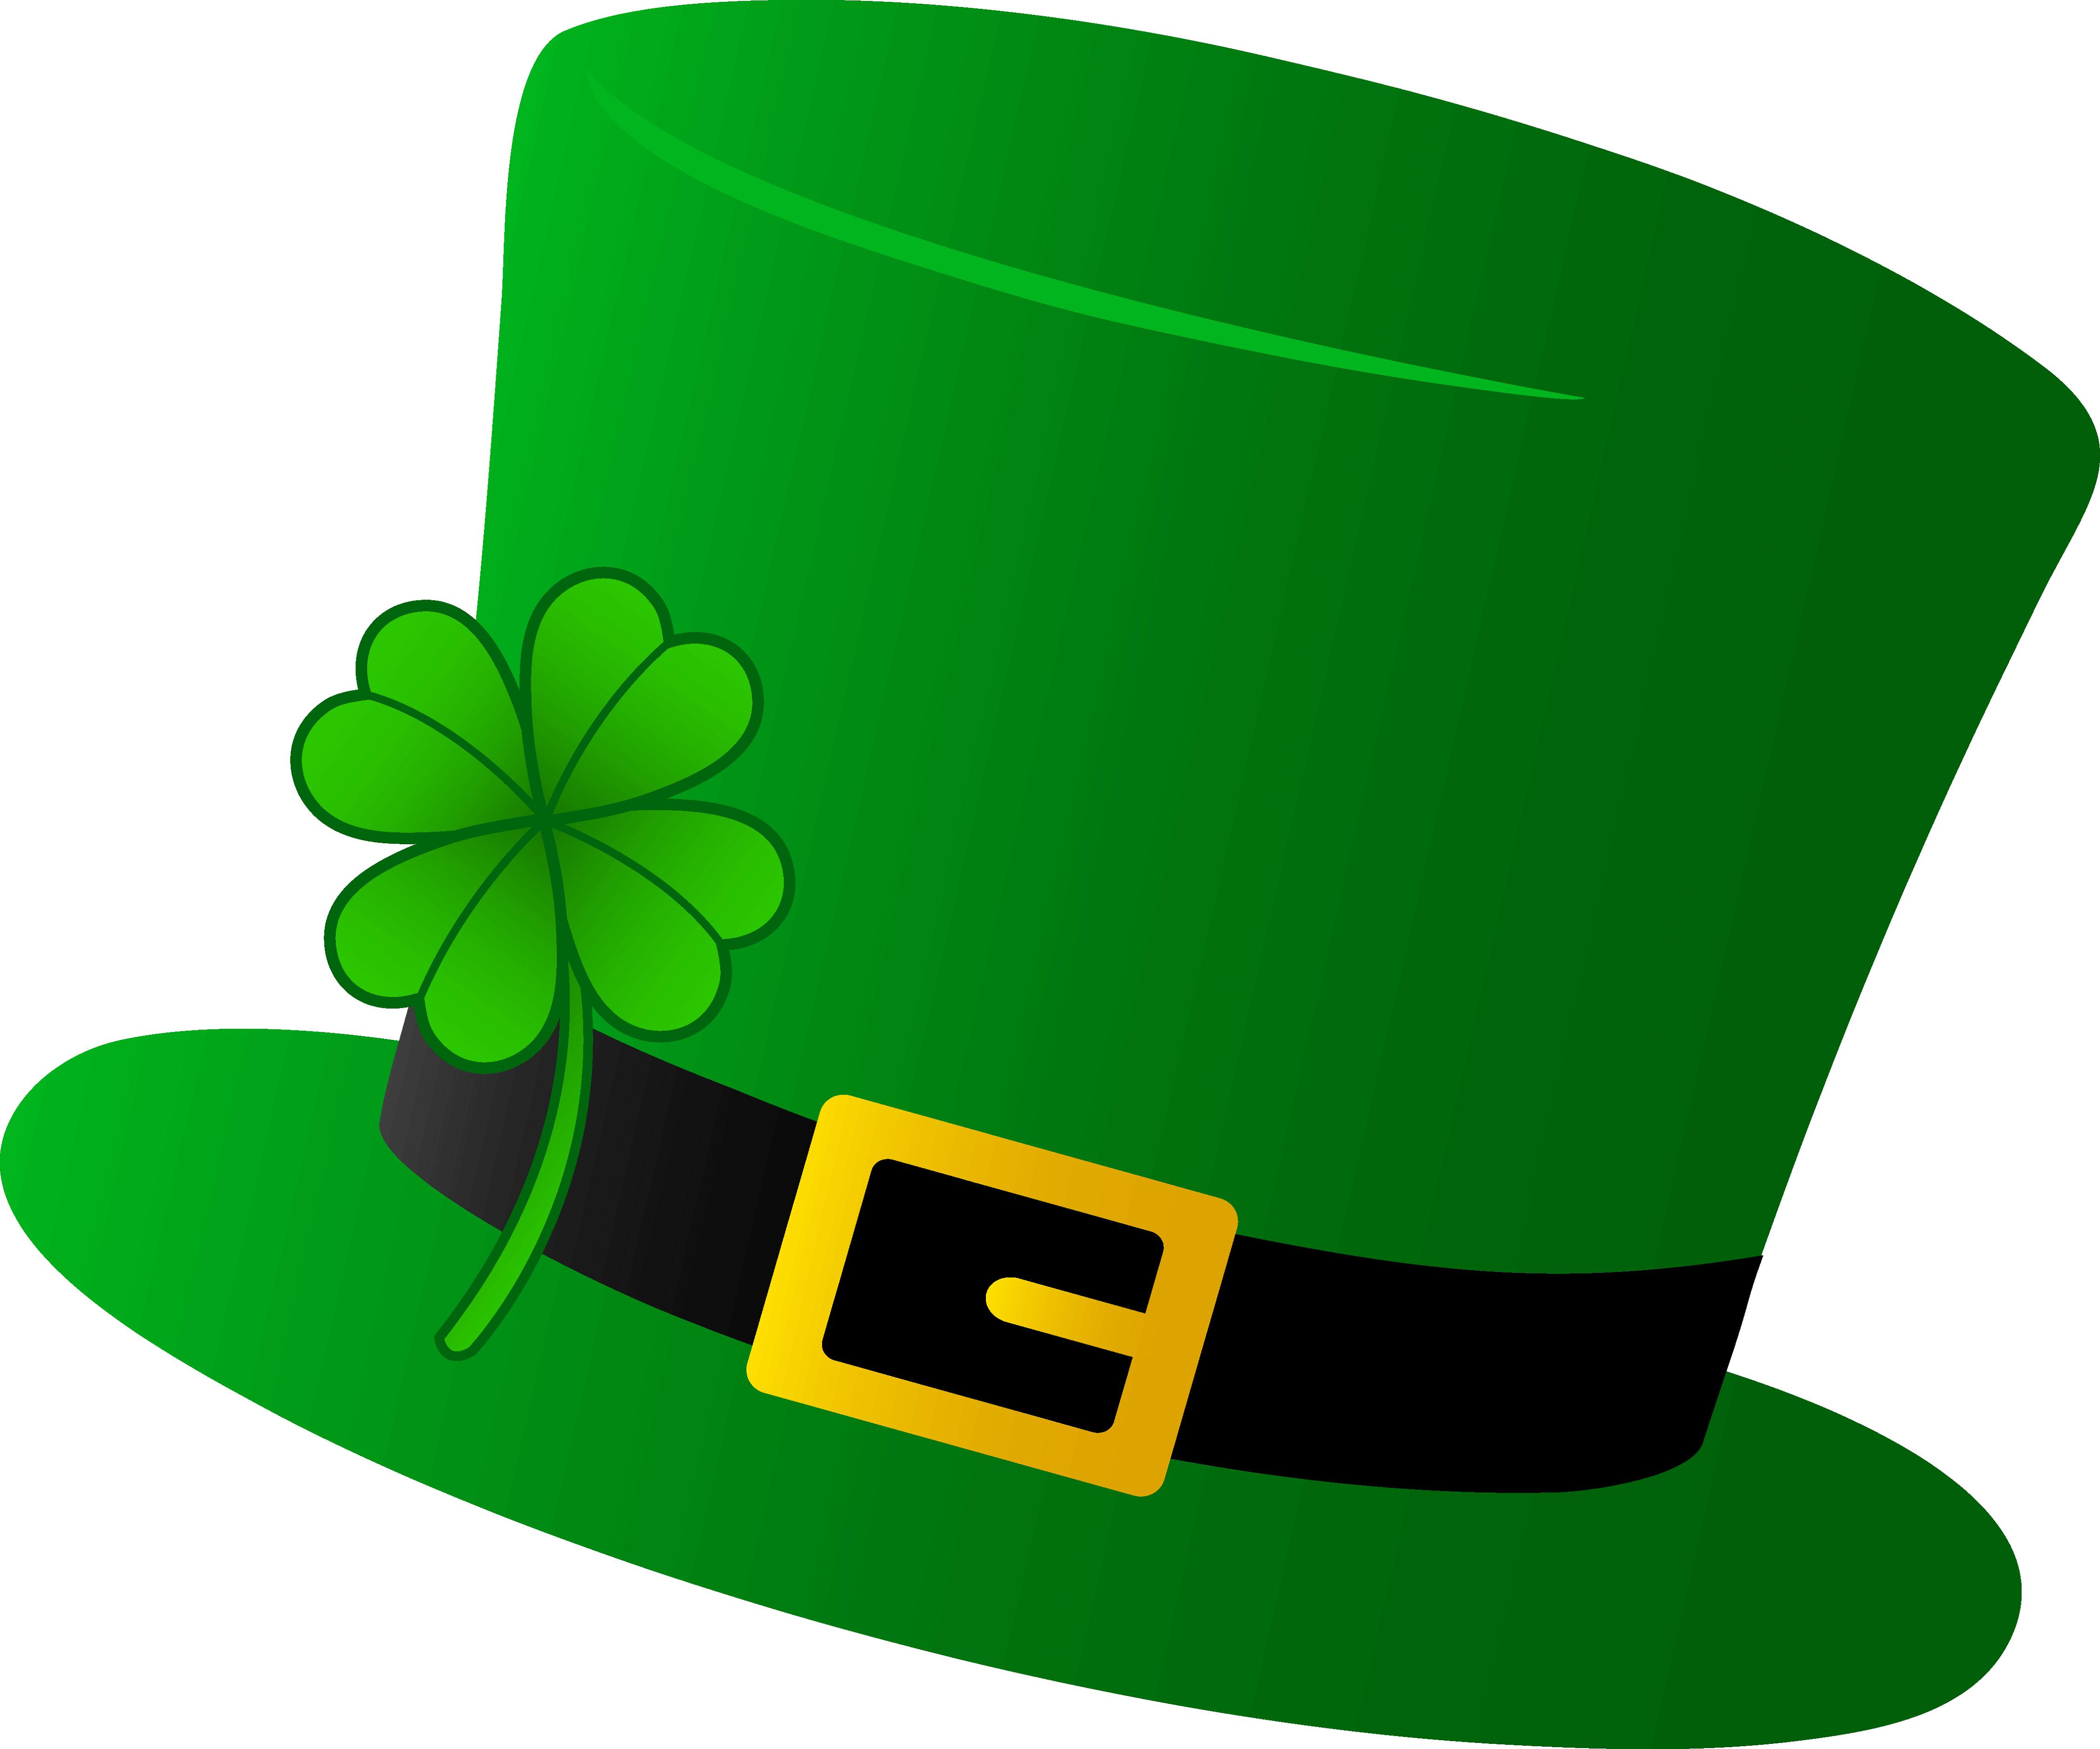 St Patricks Day Hd Clipart.